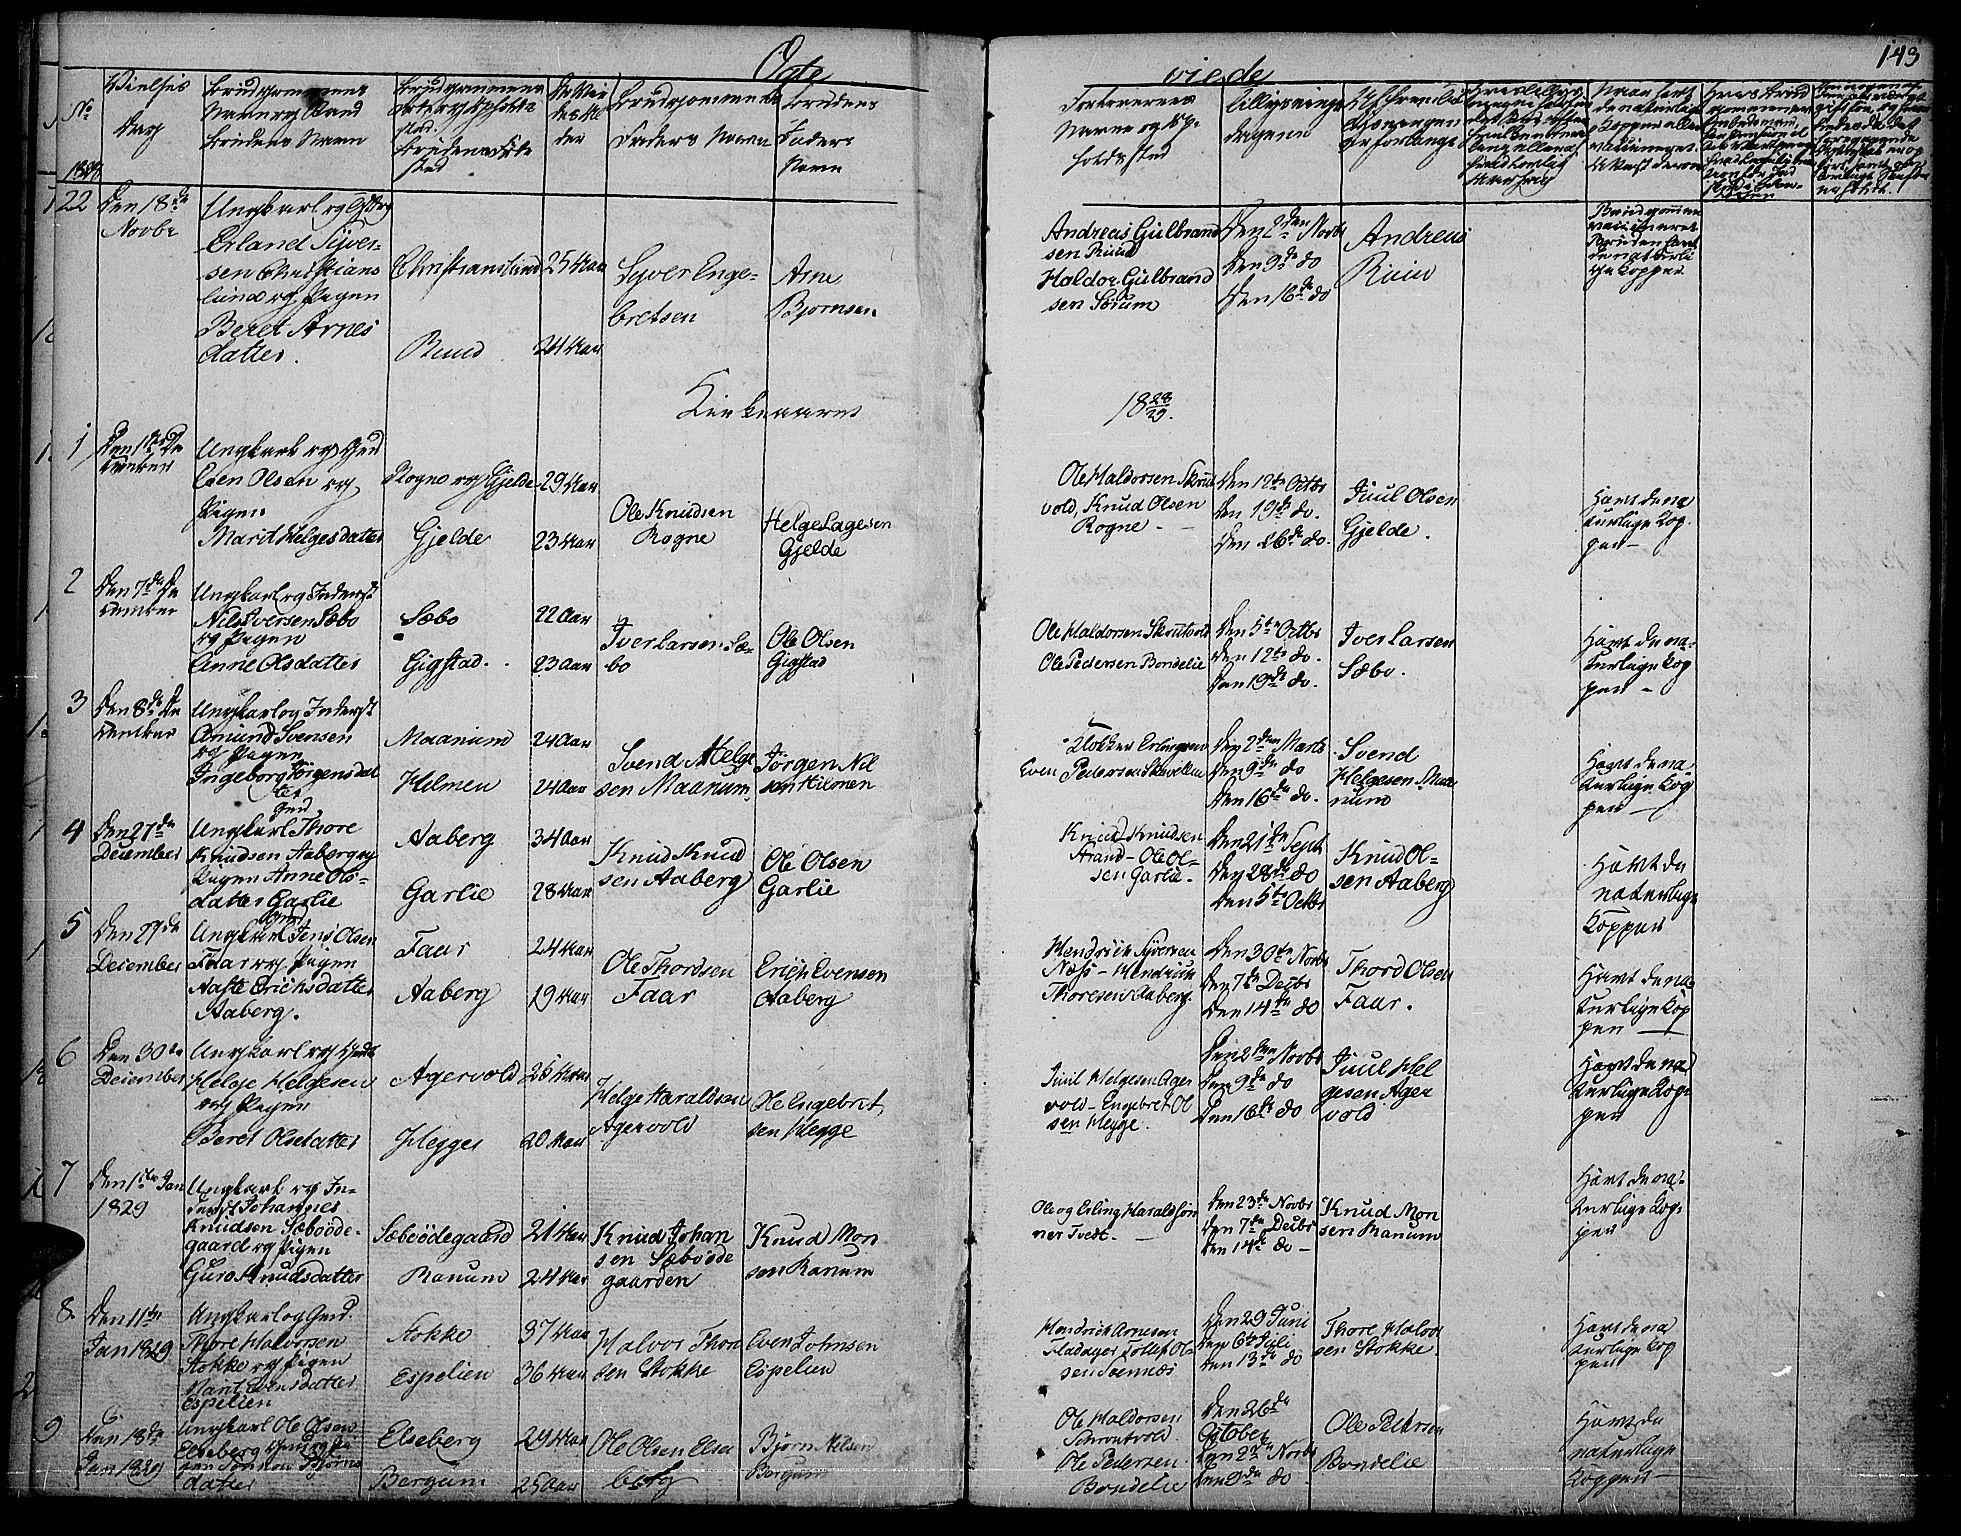 SAH, Nord-Aurdal prestekontor, Ministerialbok nr. 3, 1828-1841, s. 143